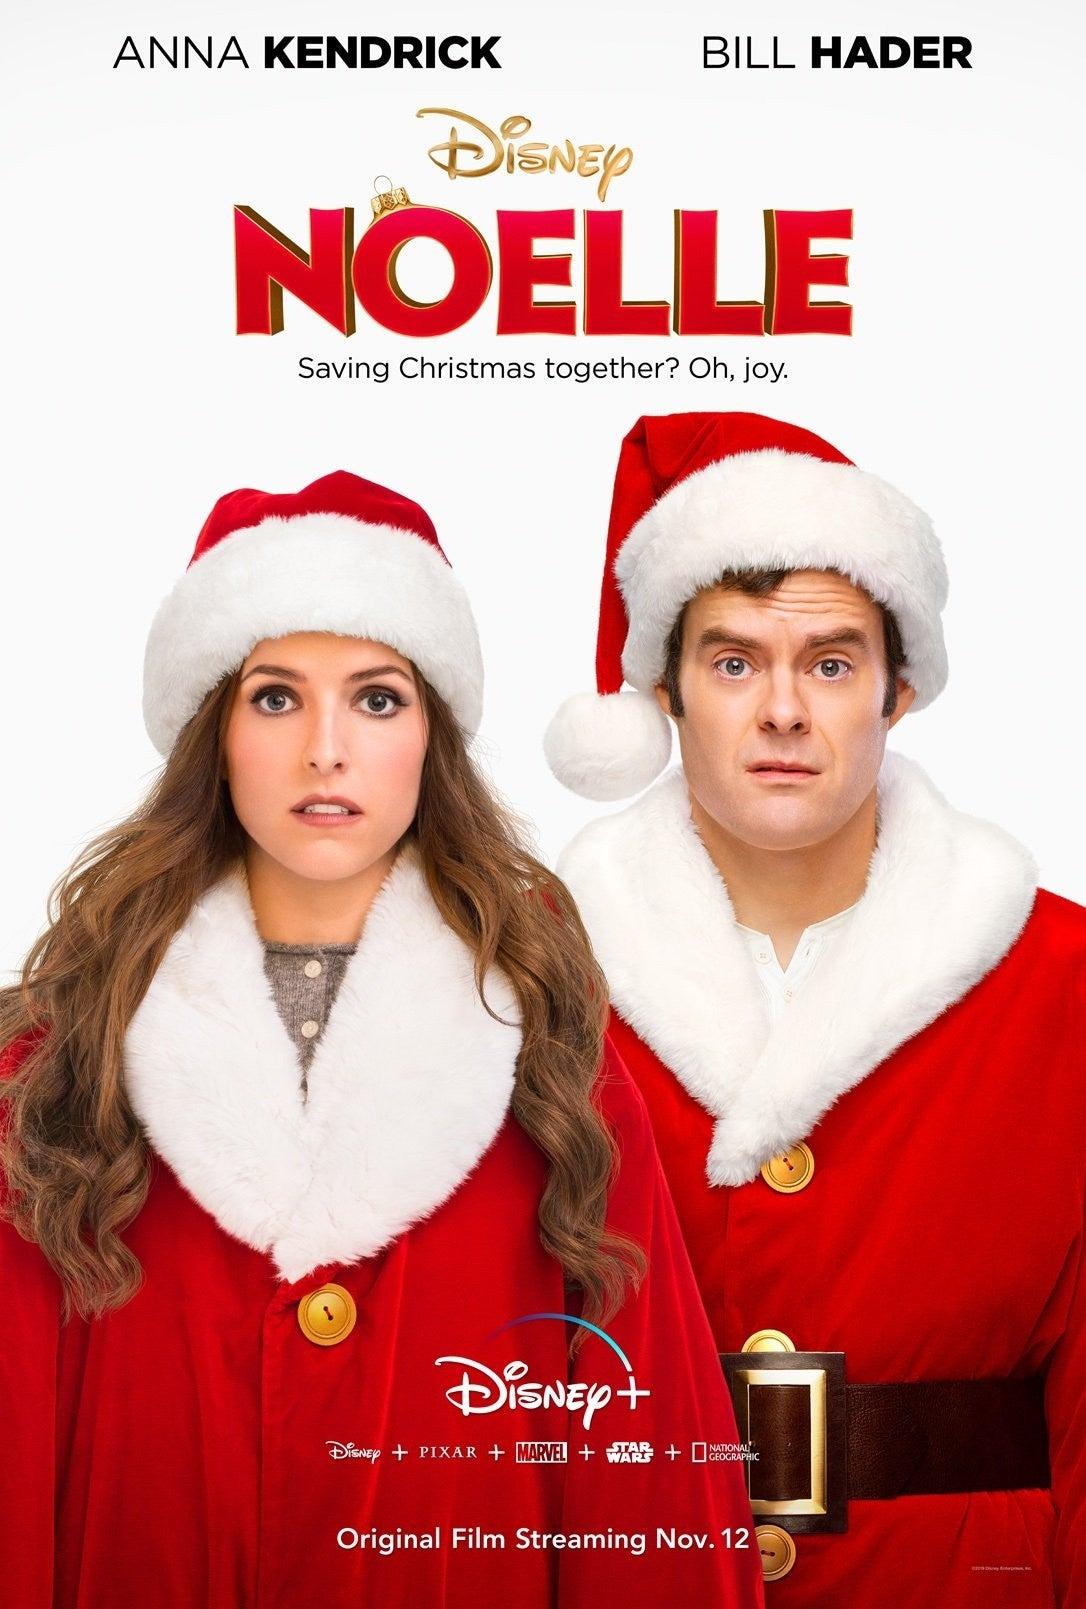 Disney's Noelle Movie Poster